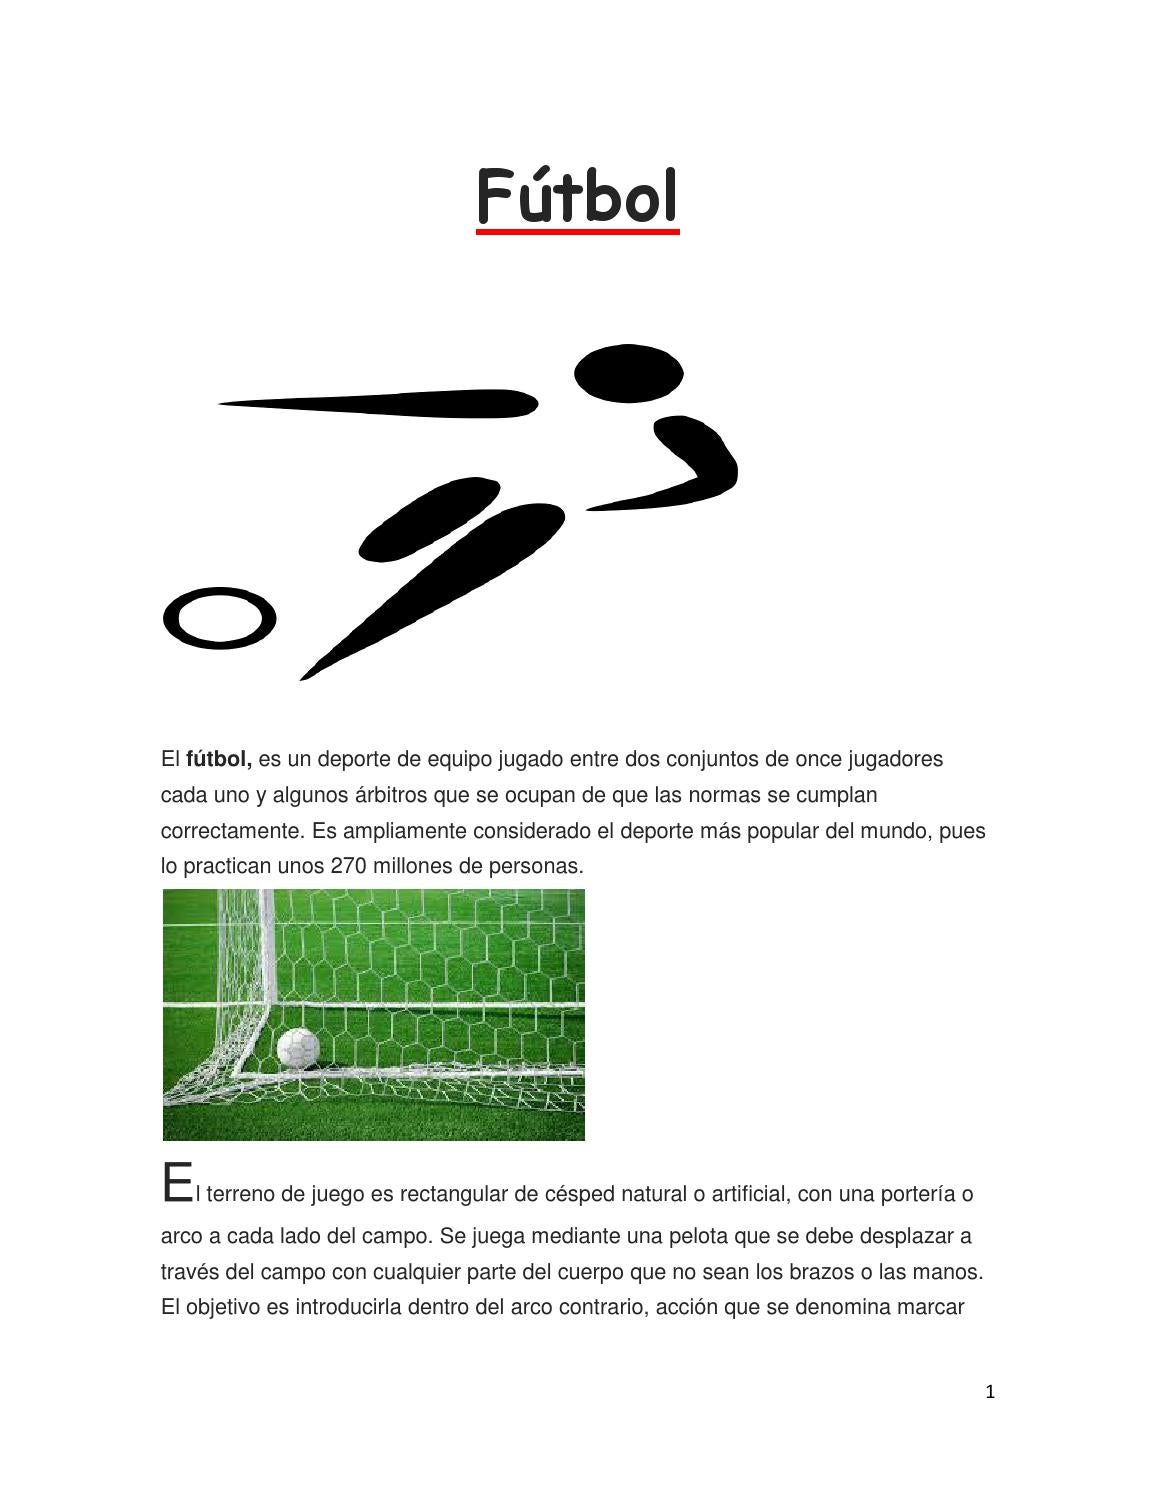 tbol profile